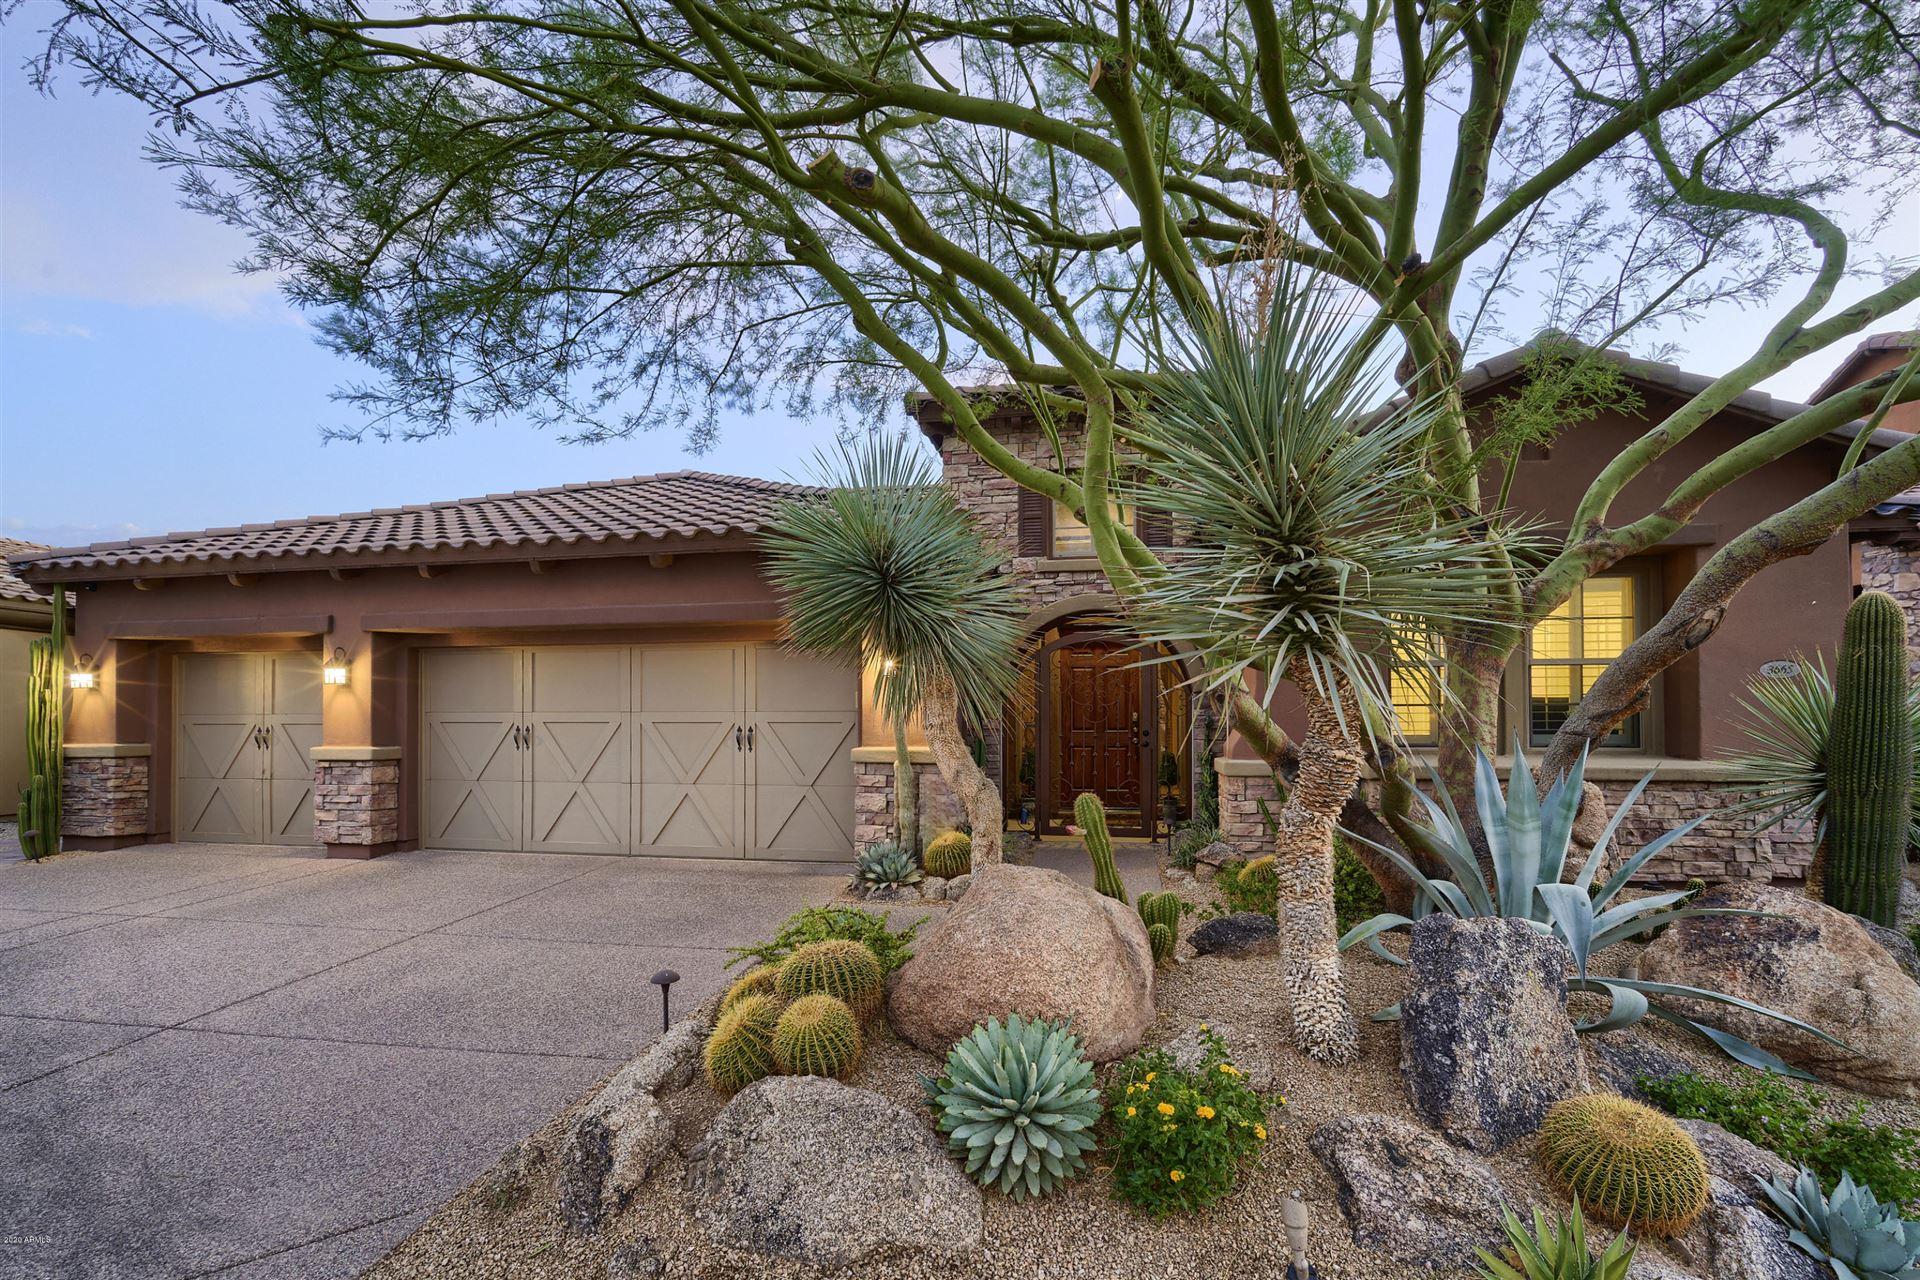 3665 E ADOBE Drive, Phoenix, AZ 85050 - MLS#: 6155962